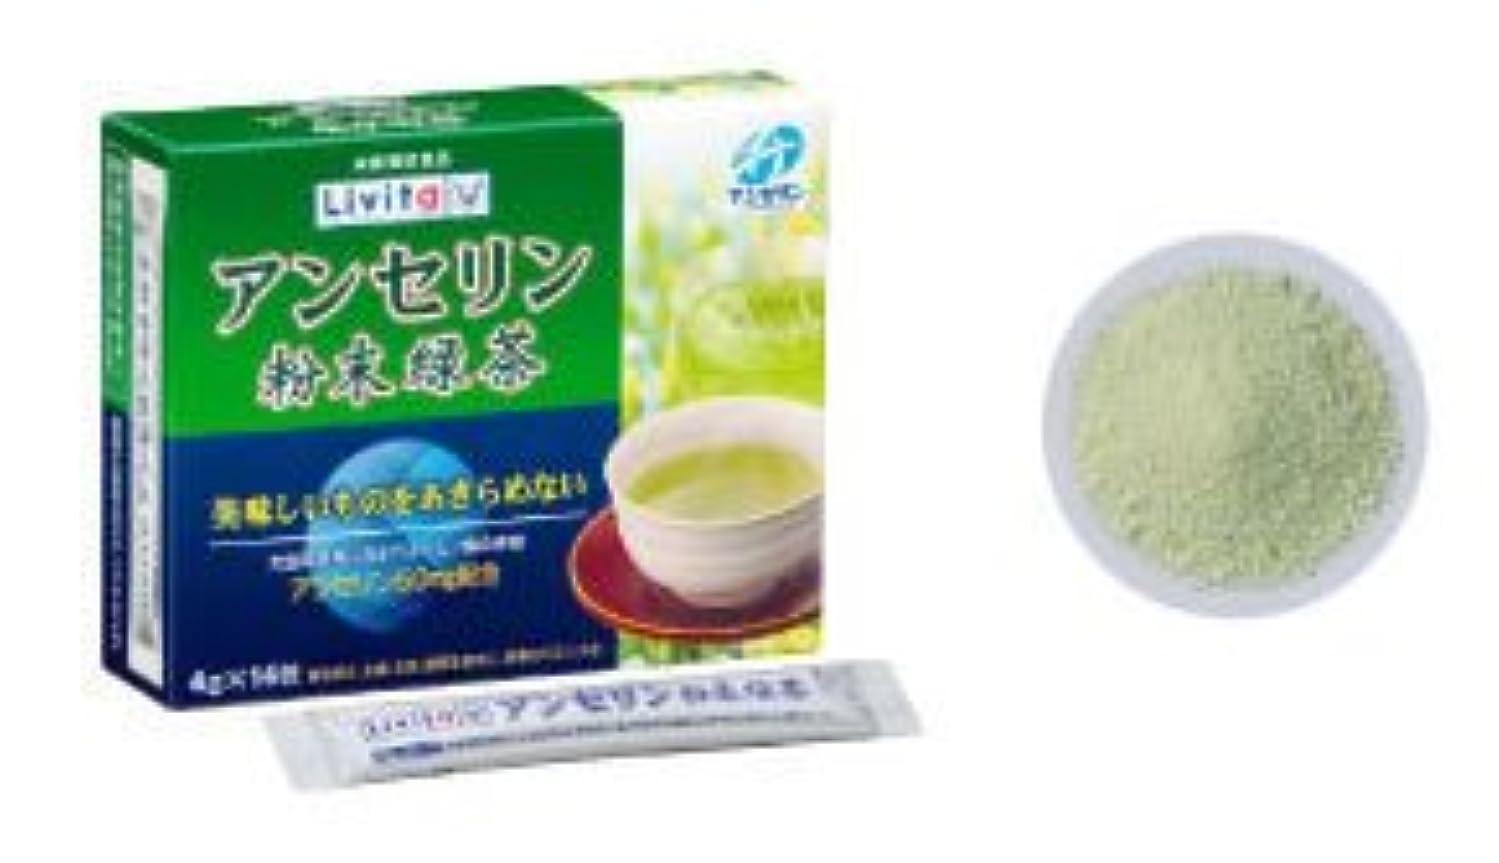 入口耐久修正【4箱】大正製薬アンセリン粉末緑茶 4g×14入x4箱 (4987306018303-4)